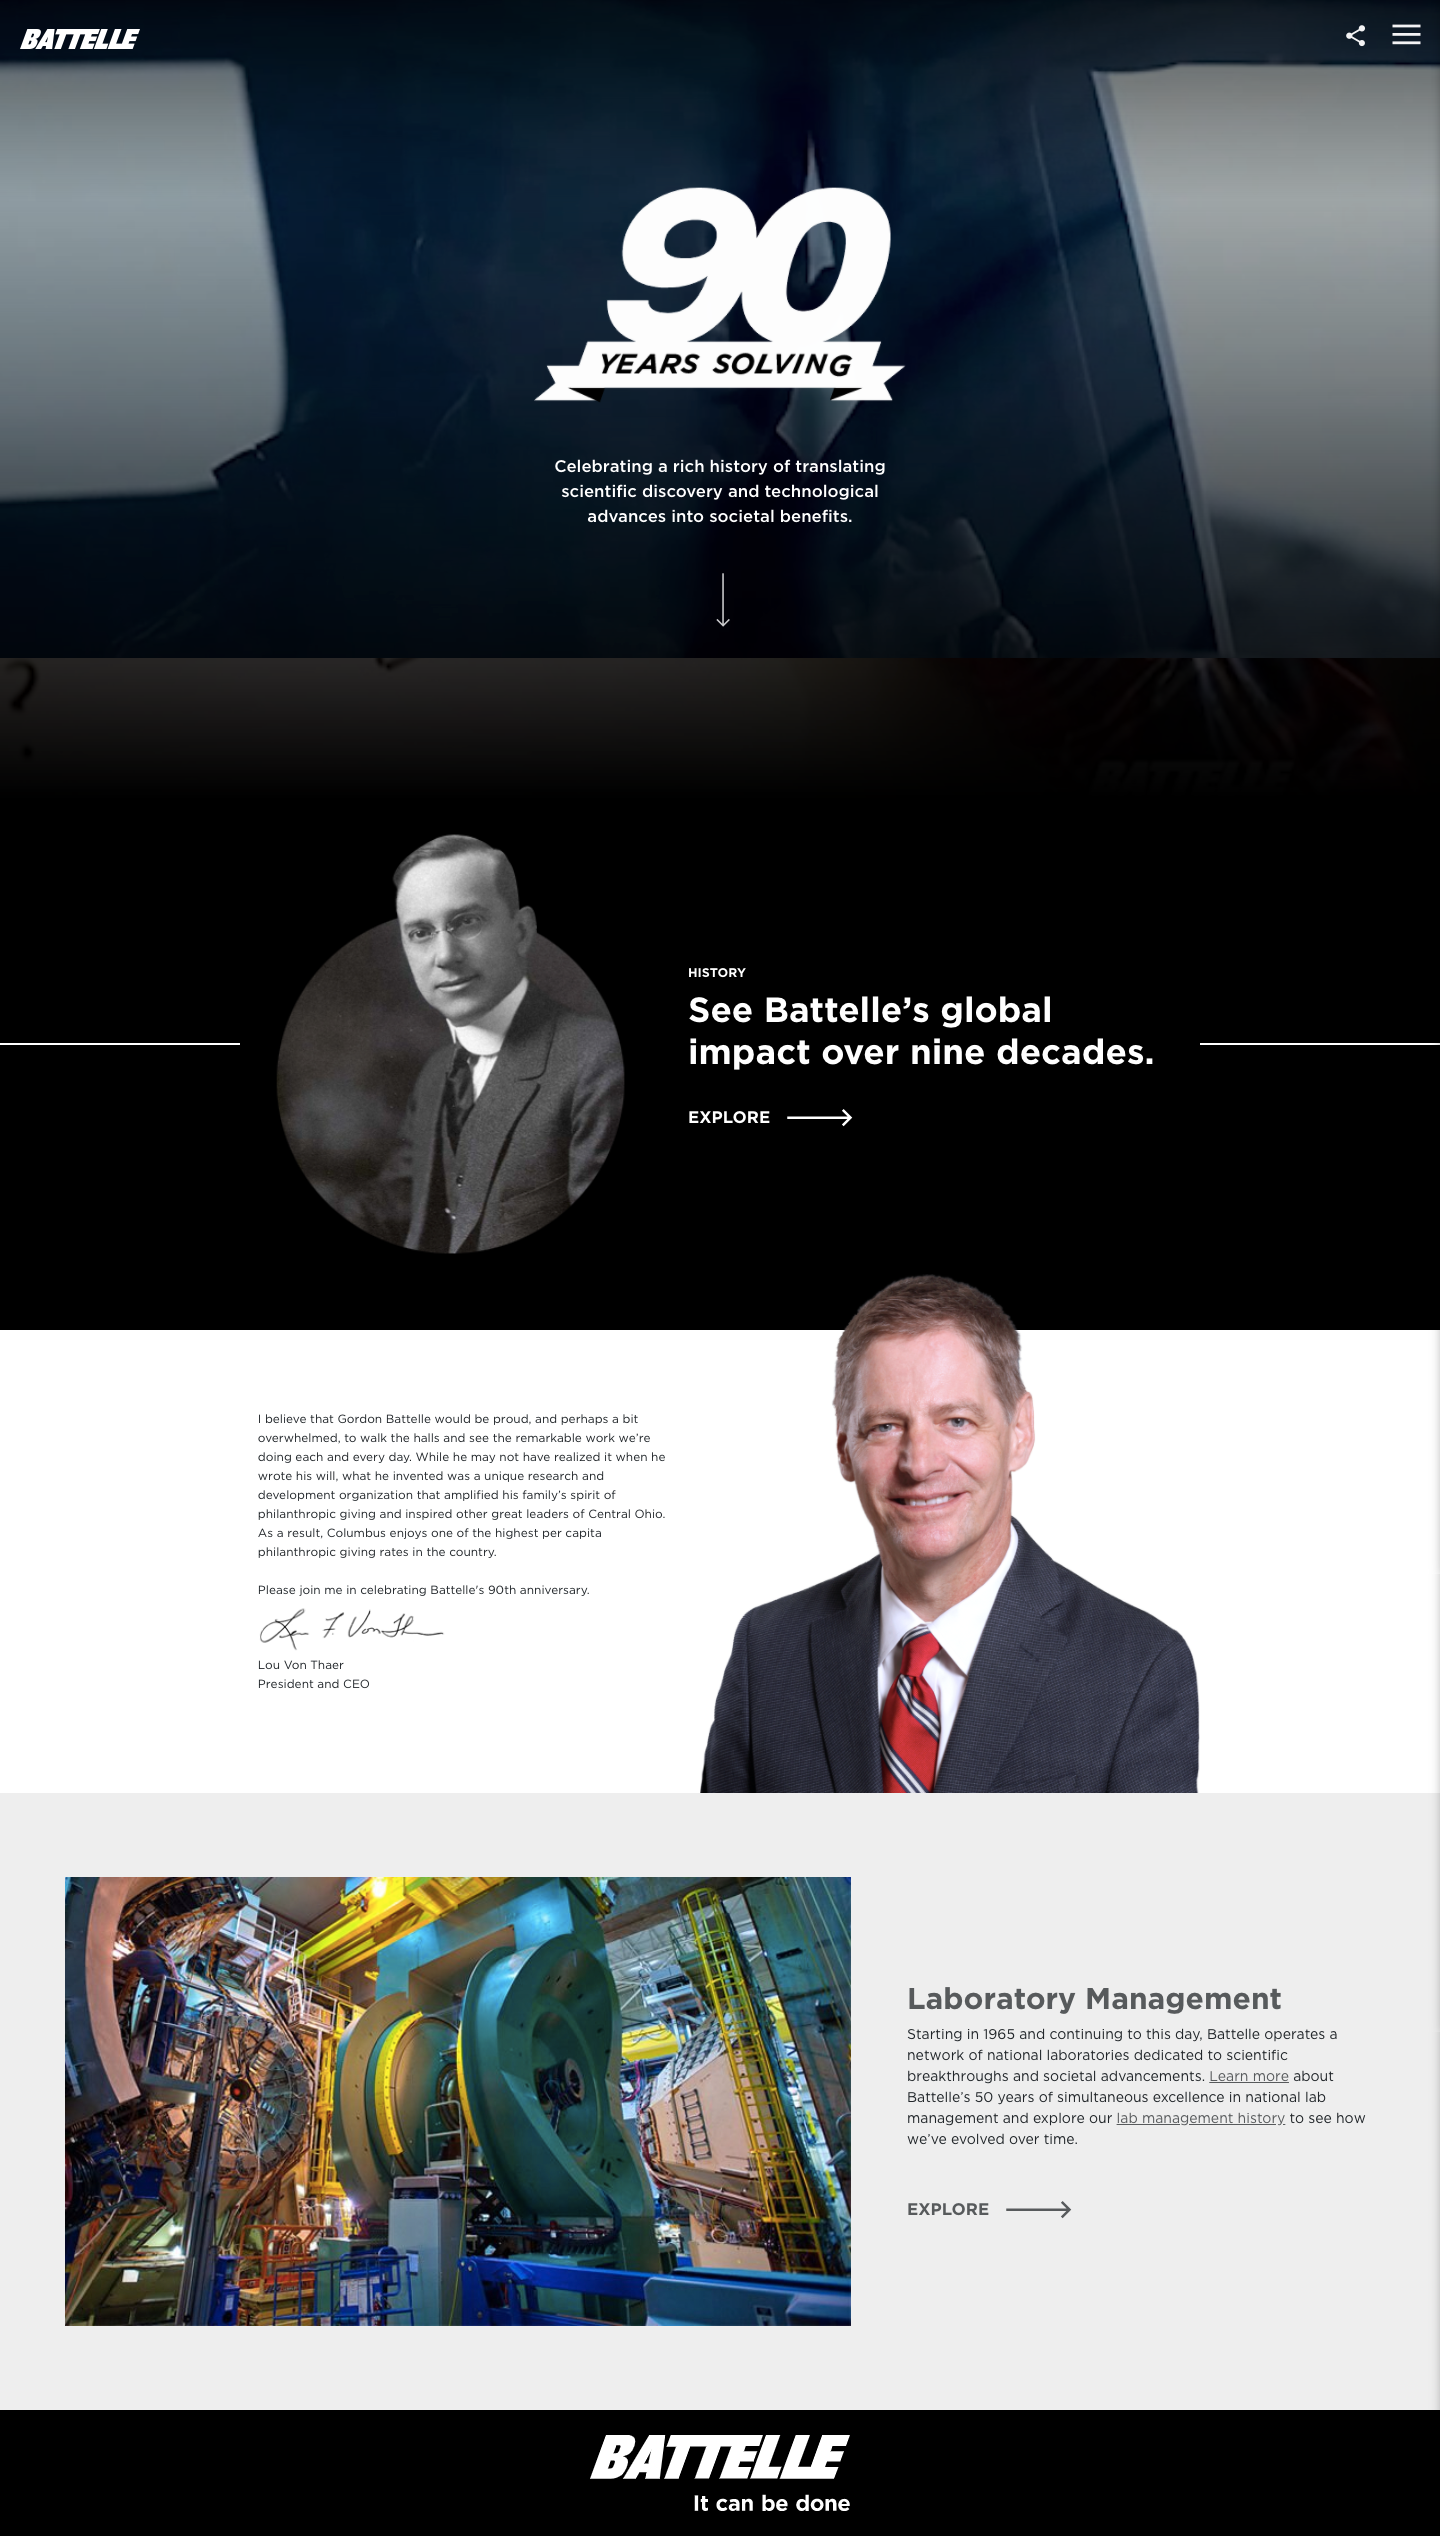 Battelle 90th Anniversary Microsite image